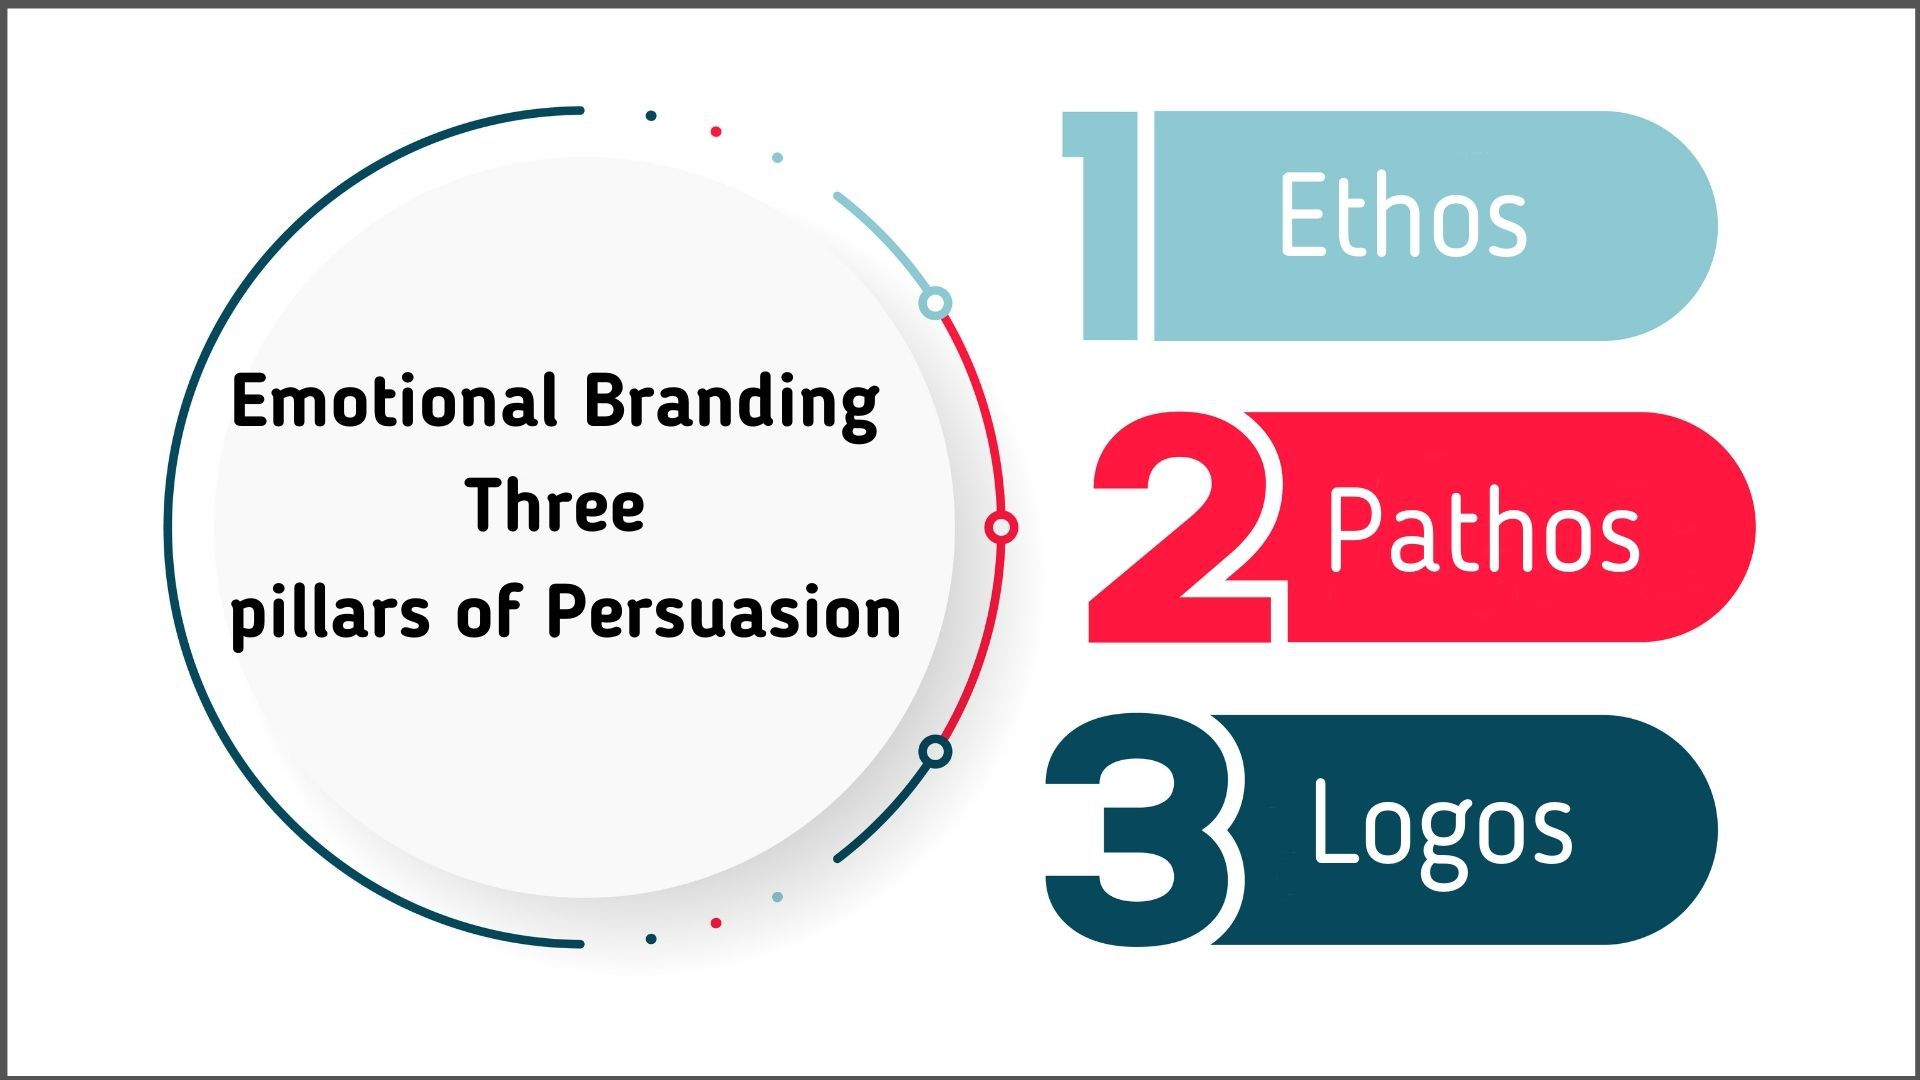 Emotional Branding & Aristotle's three pillars of Persuasion